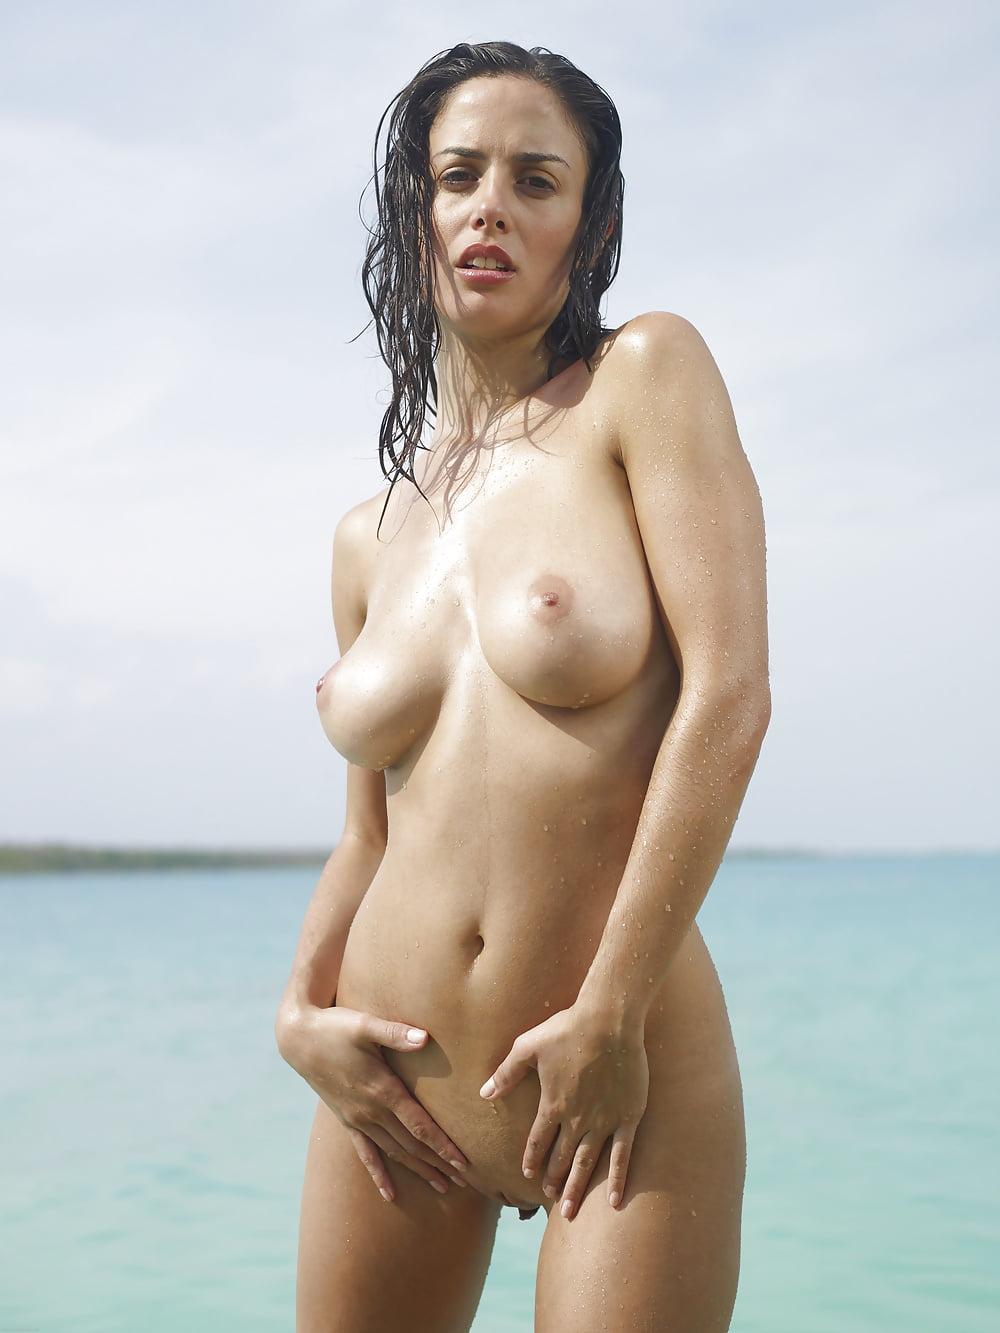 Big tits italian ex girlfriend posing nude in car